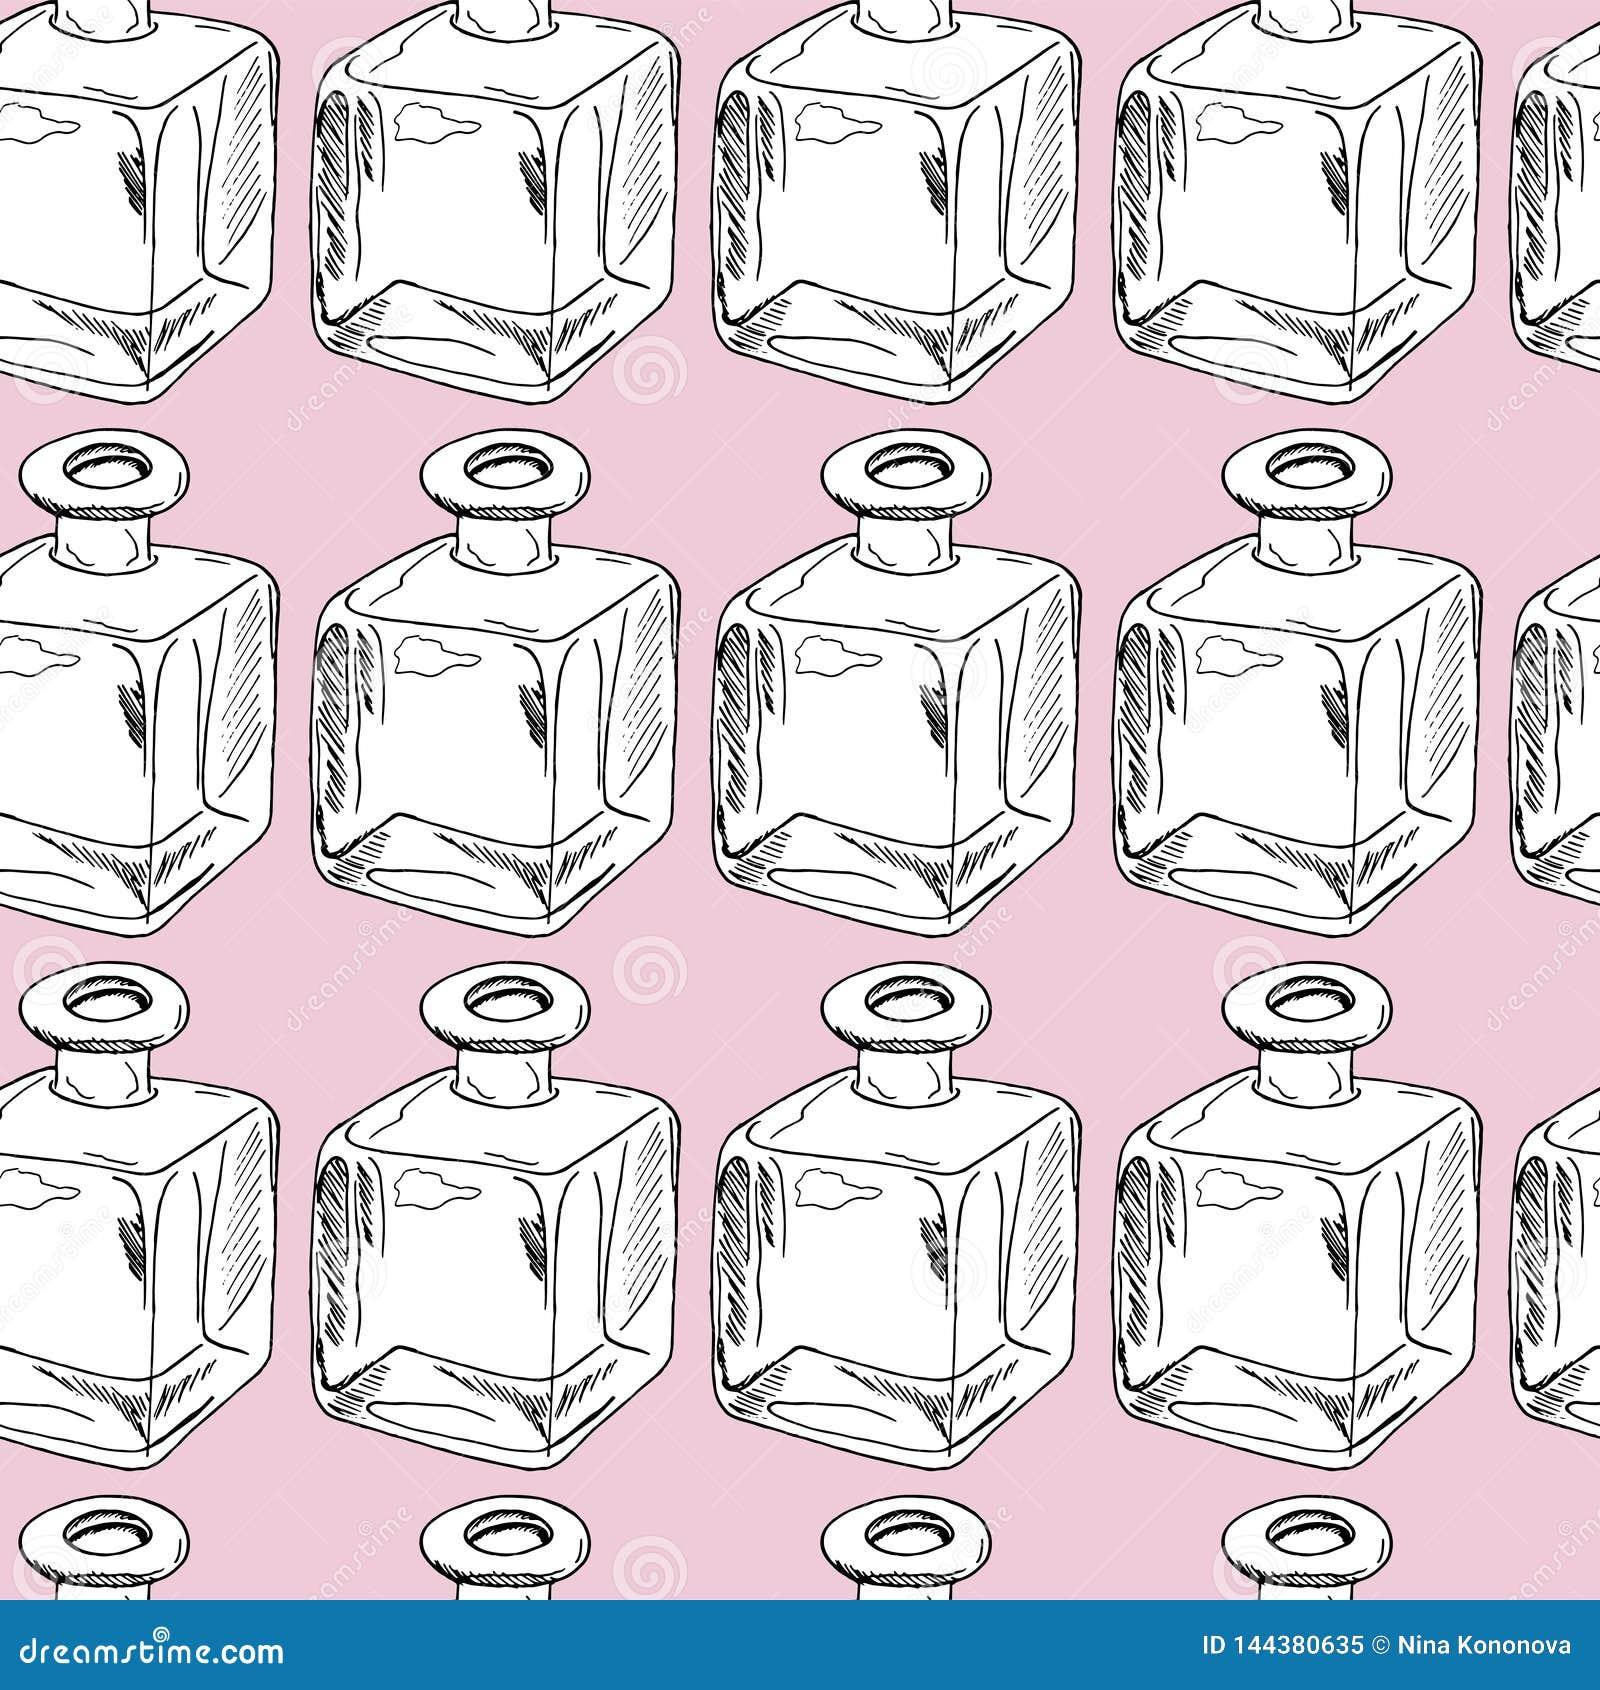 Hand draw seamless pattern. Glass bottles. Vector illustration